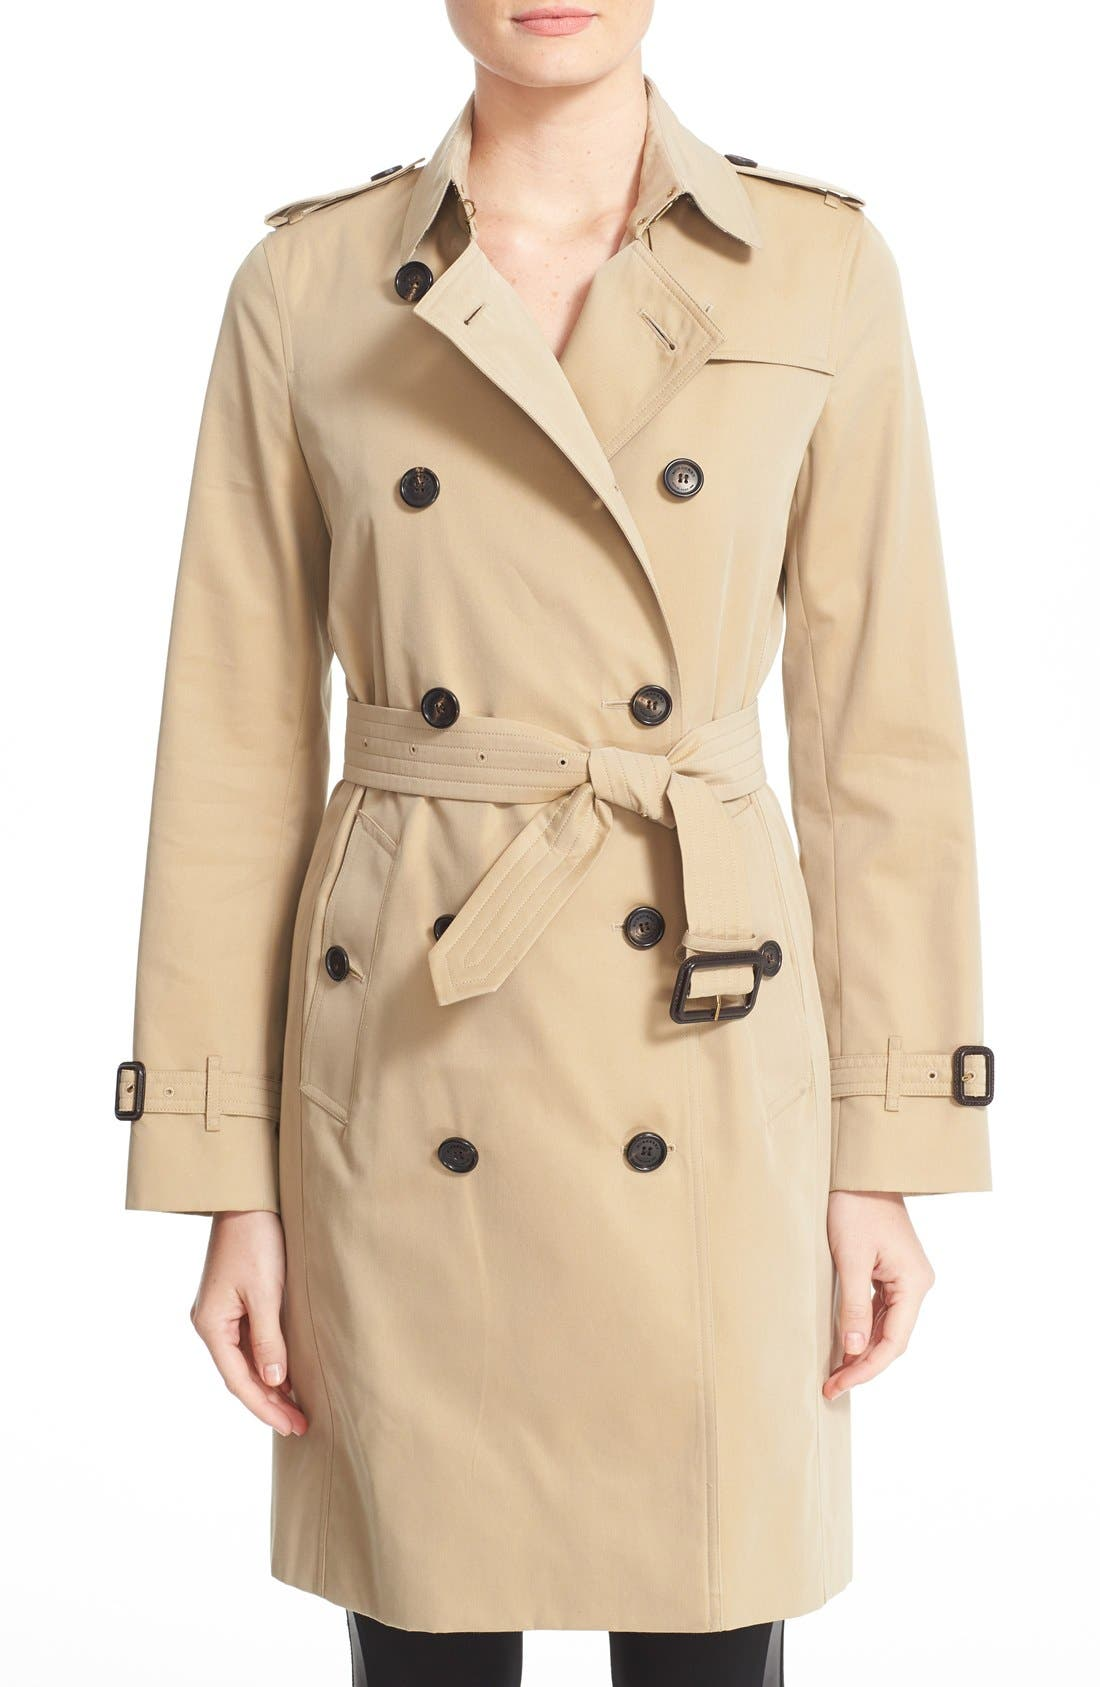 BURBERRY, Kensington Long Trench Coat, Main thumbnail 1, color, HONEY